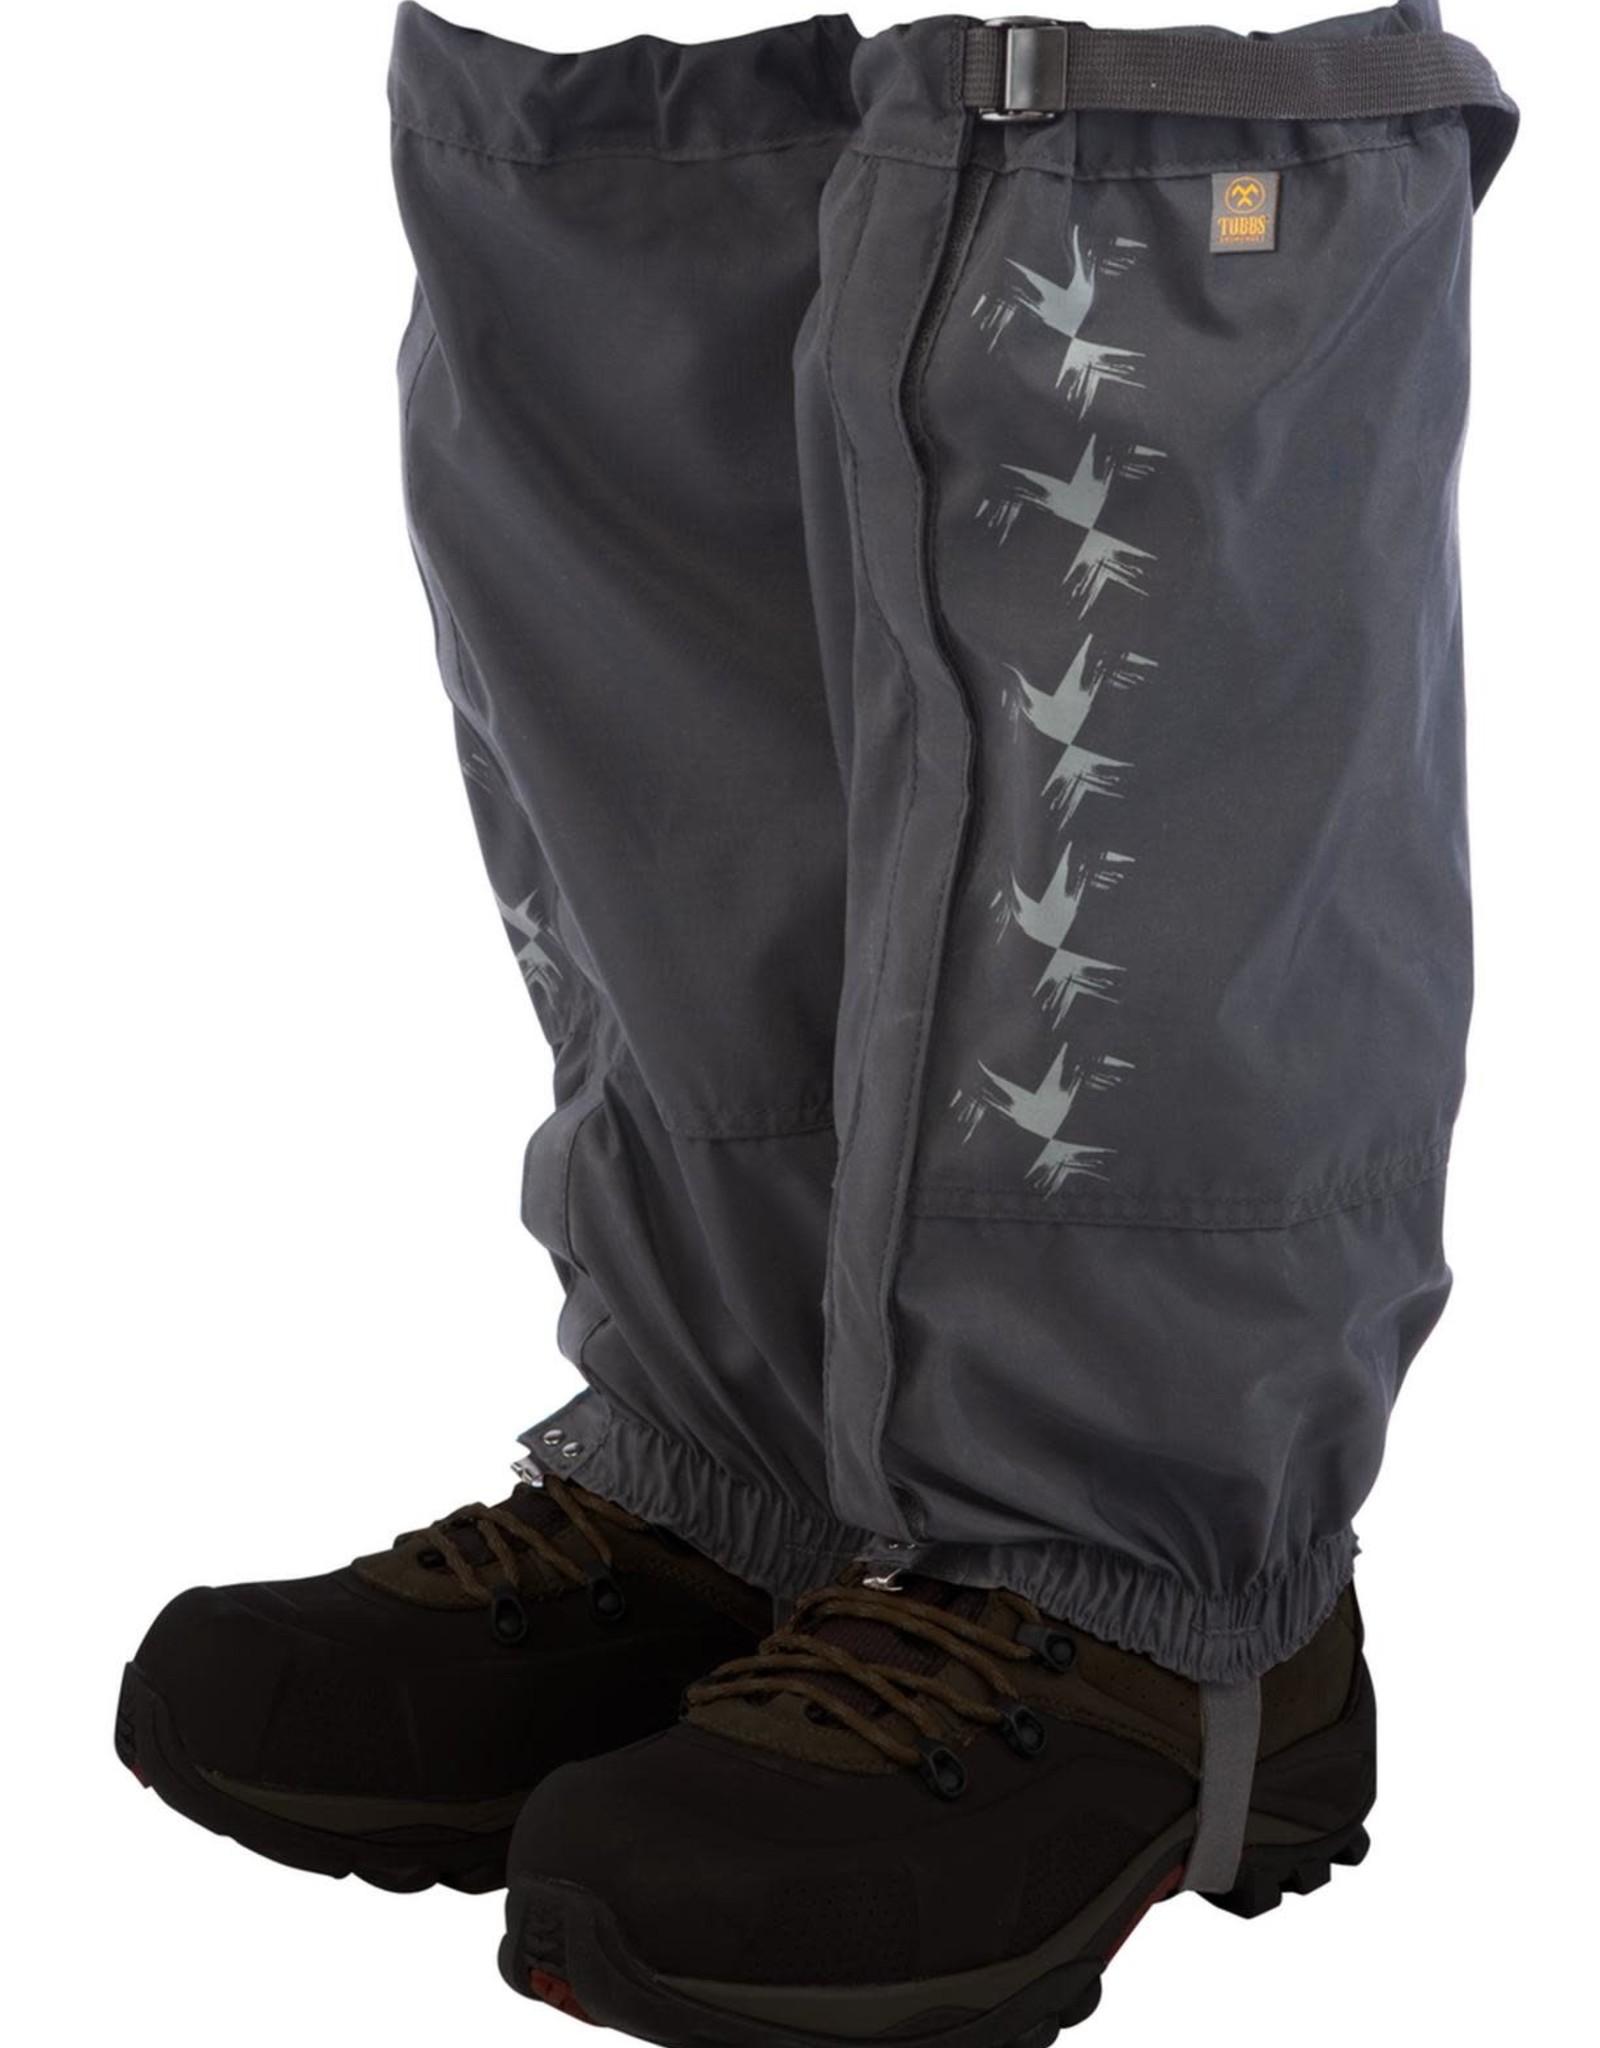 Tubbs Snowshoe Gaiters